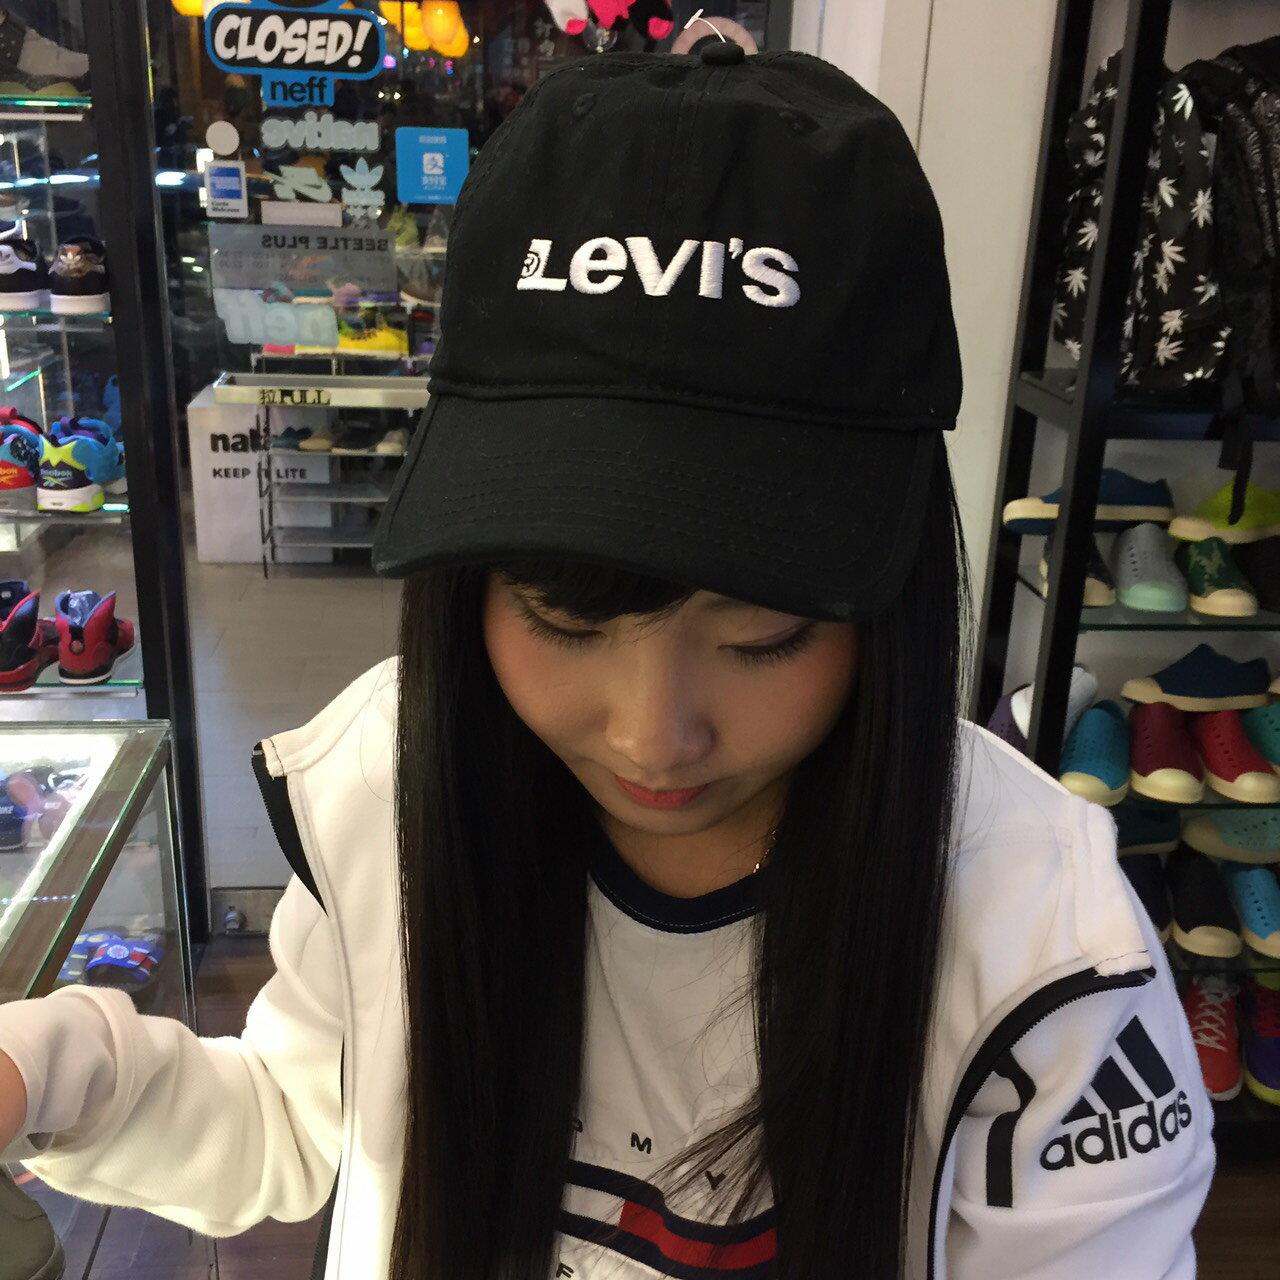 BEETLE PLUS 全新 美國購入 LEVI'S 全黑 白電繡字 復古 棒球帽 後扣式 SNAPBACK 黑白 MN-422